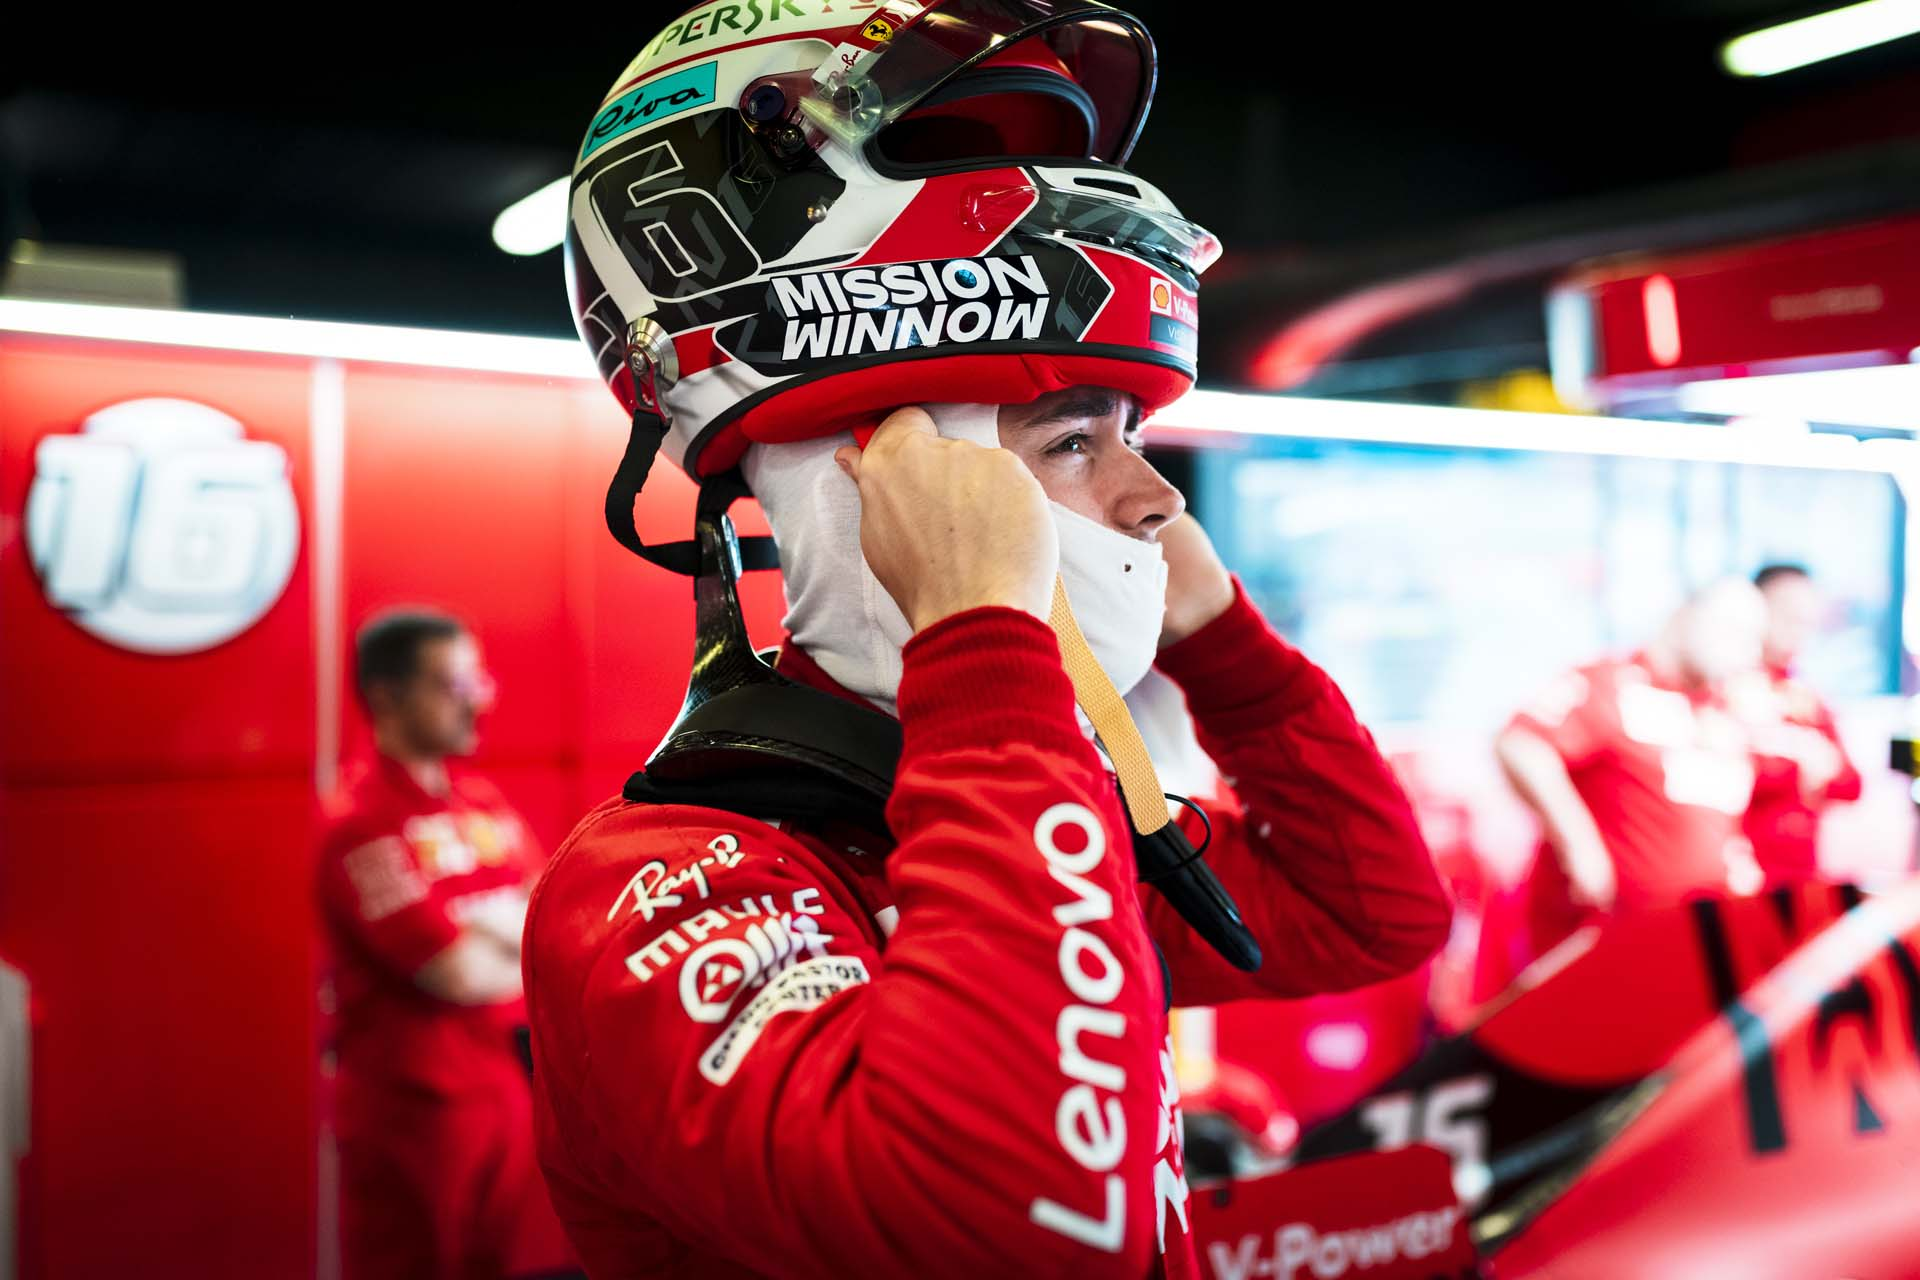 SpanishGP2019_FRI_Ferrari_190021_gp_spa